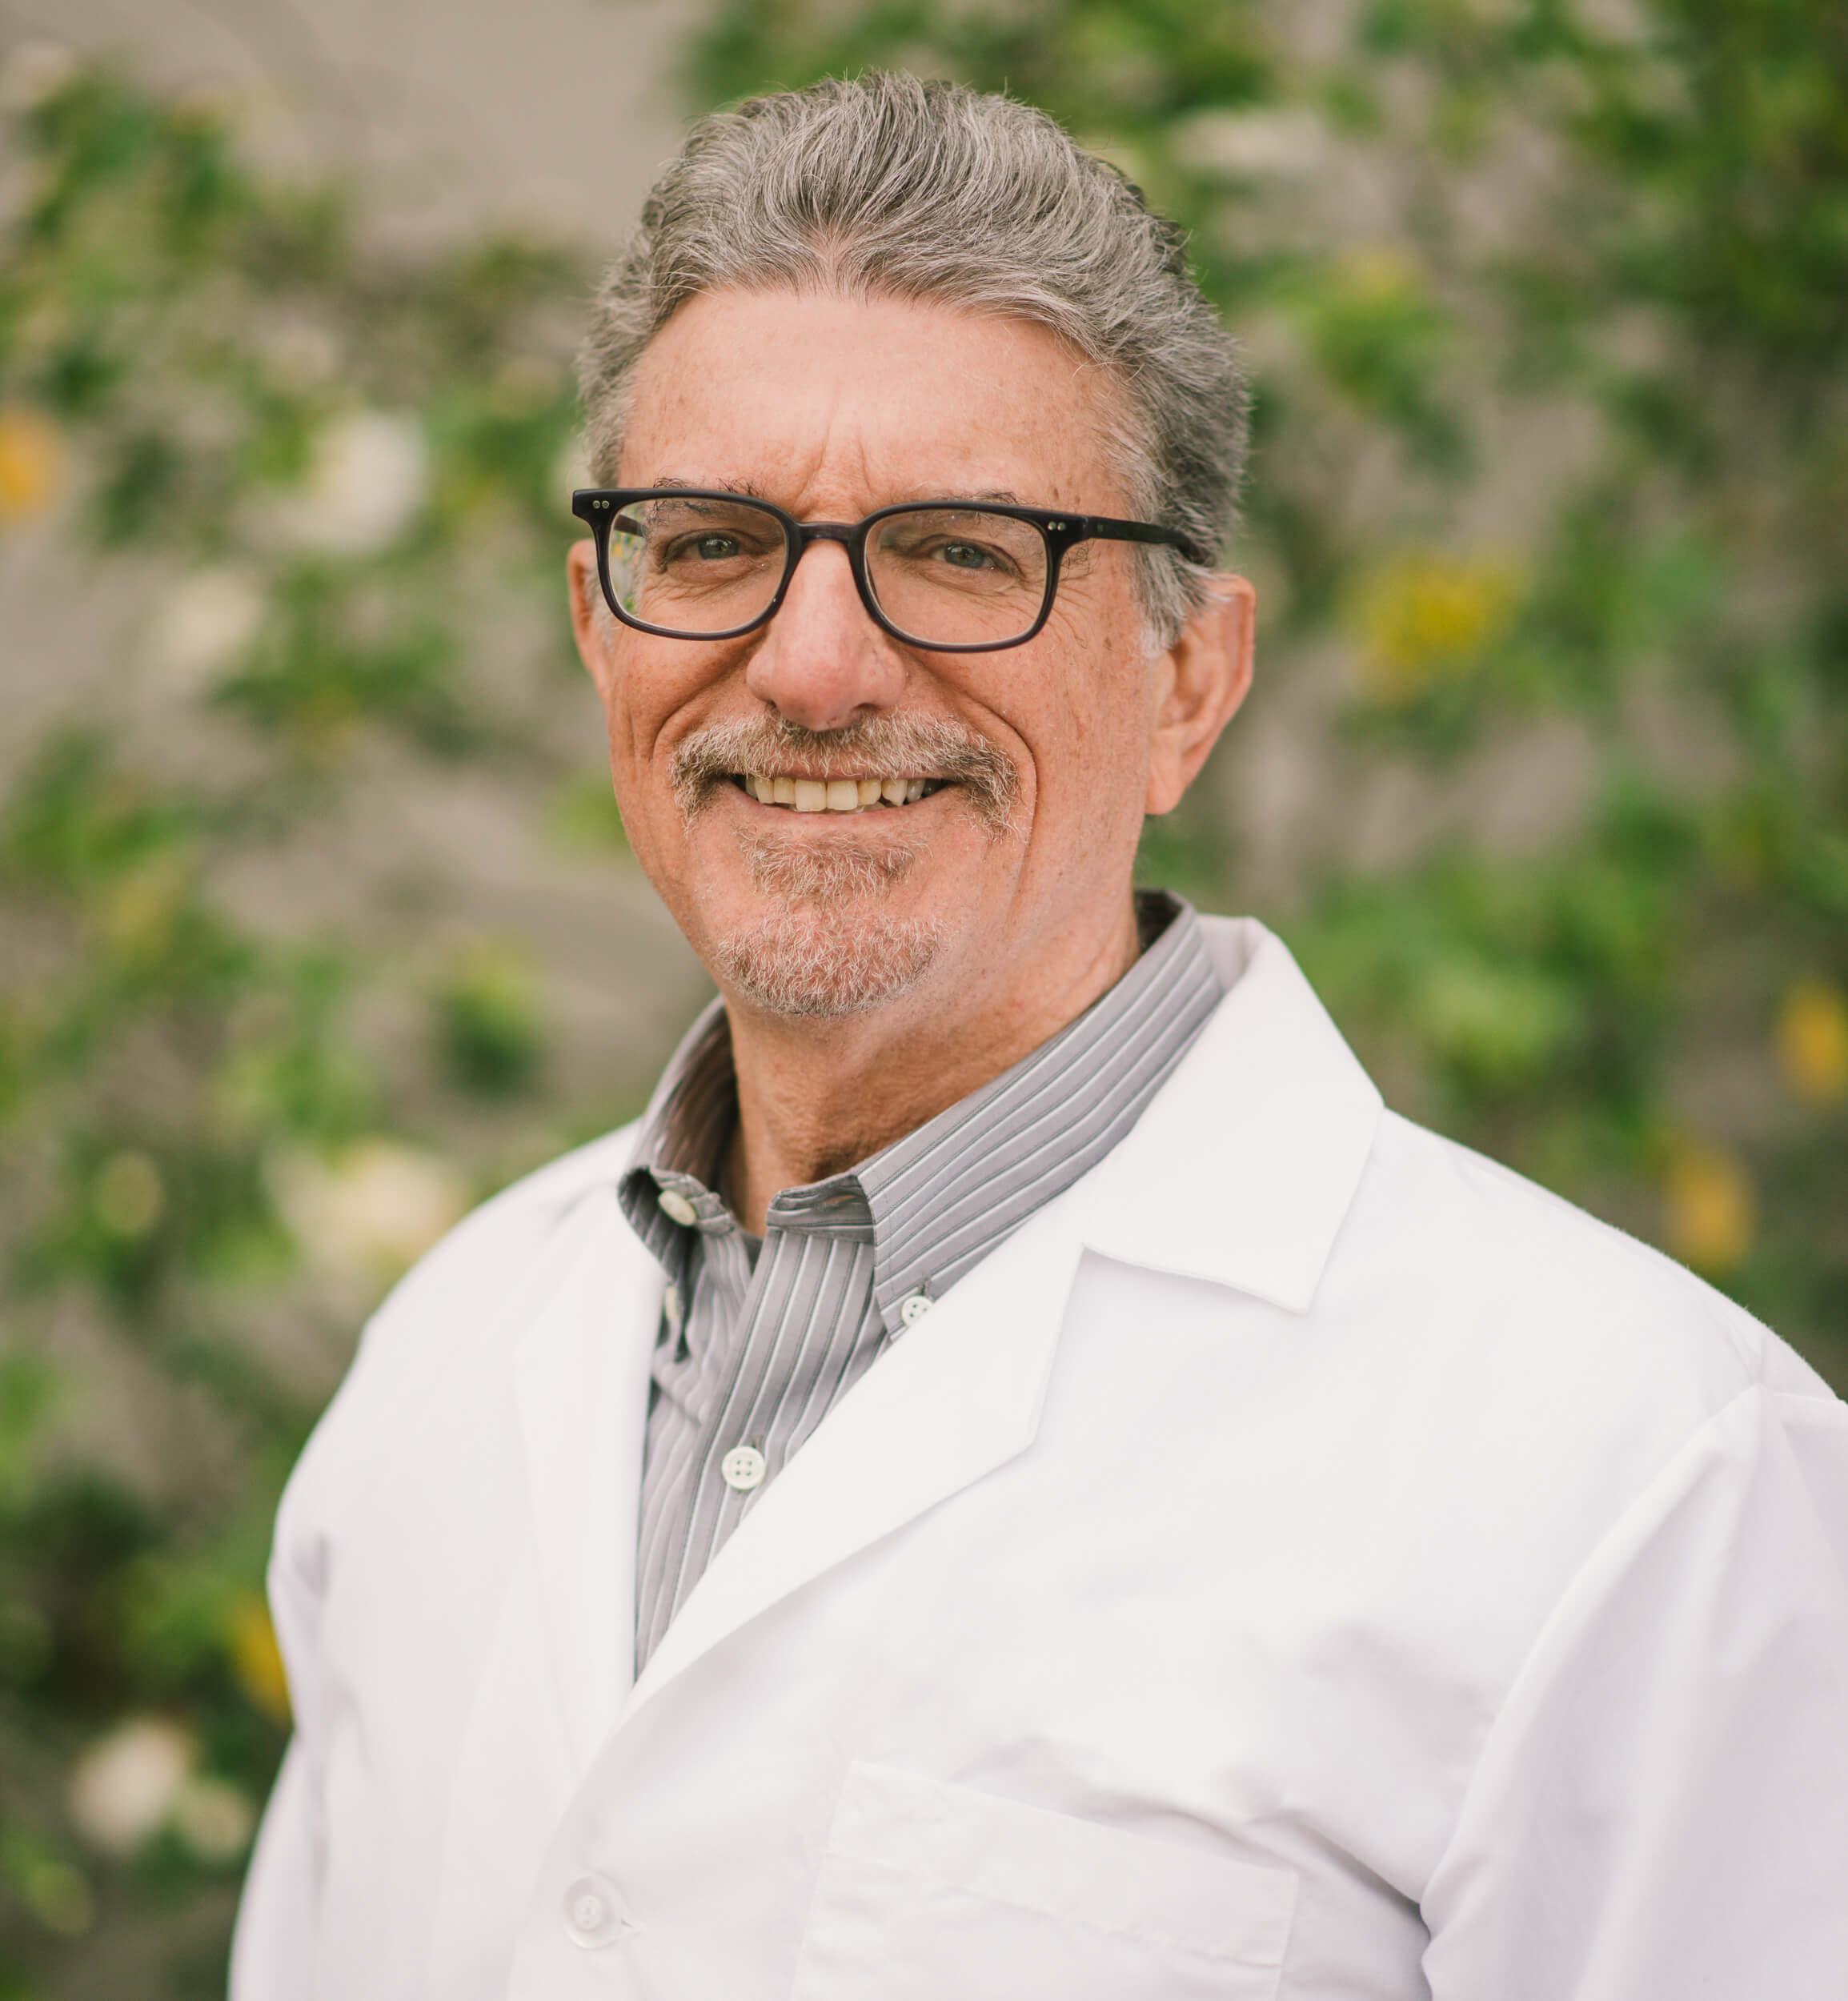 Mark S. Goldsmith, M.D.